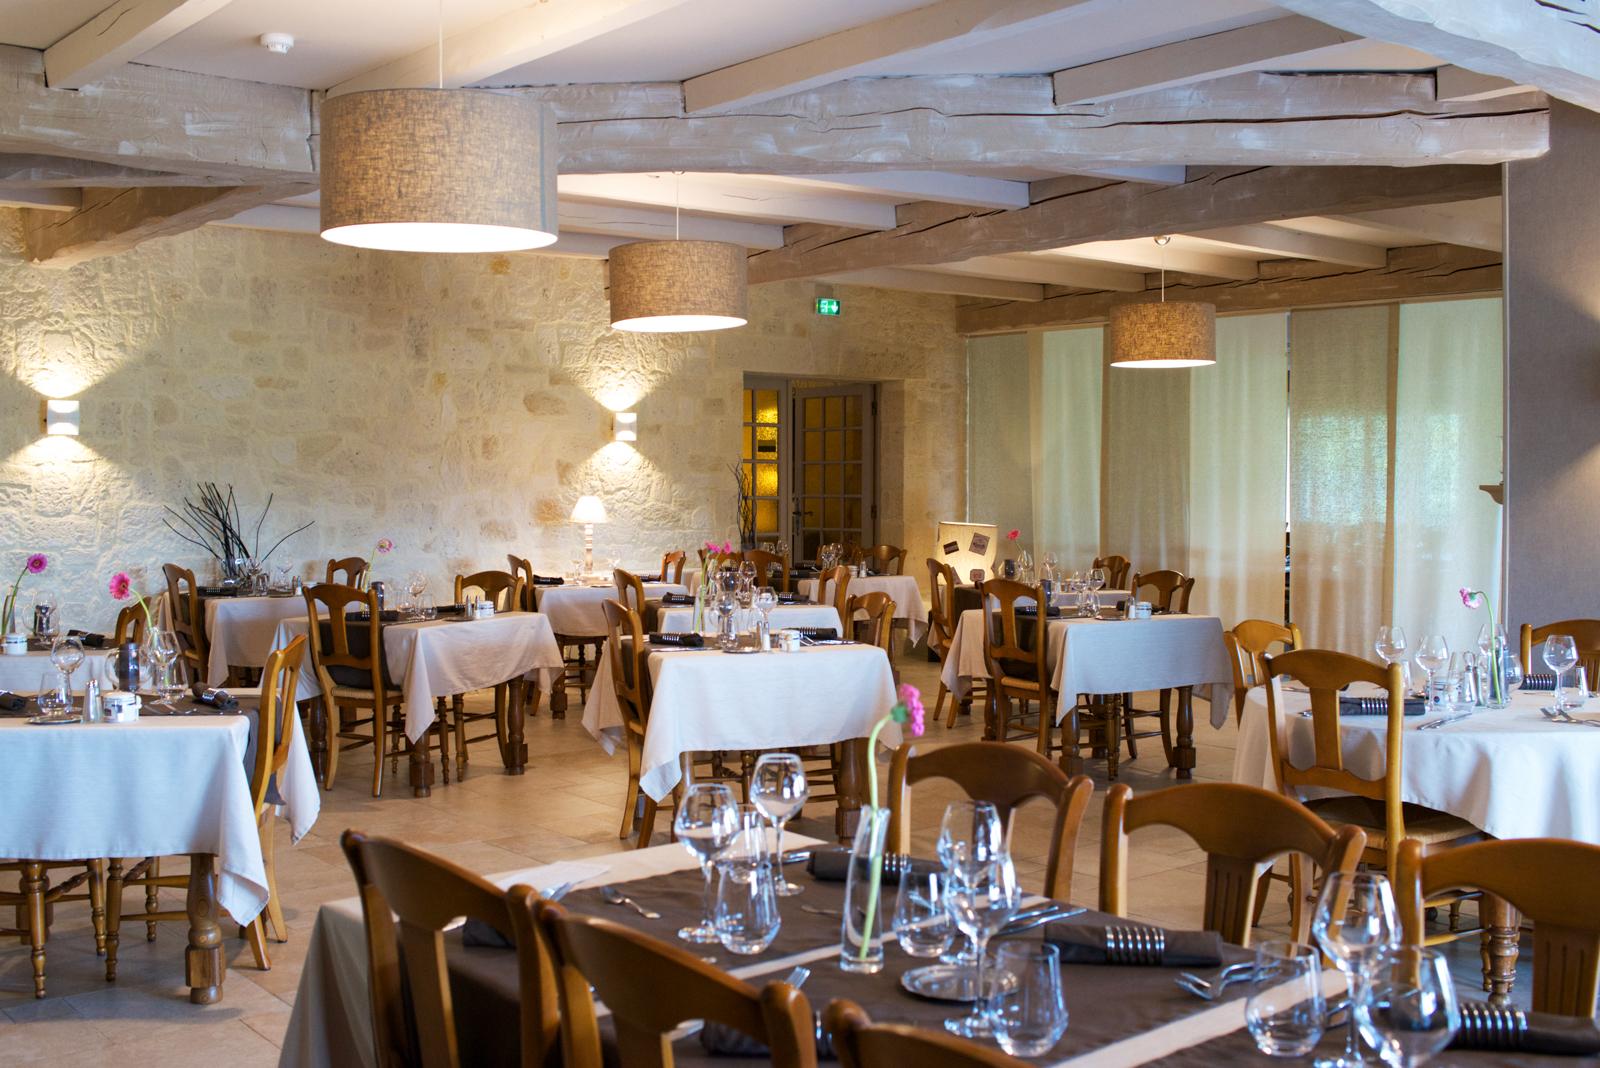 013_Hotel_Restaurant_Cevenol_Anduze_Cévennes_Gard_Occitanie